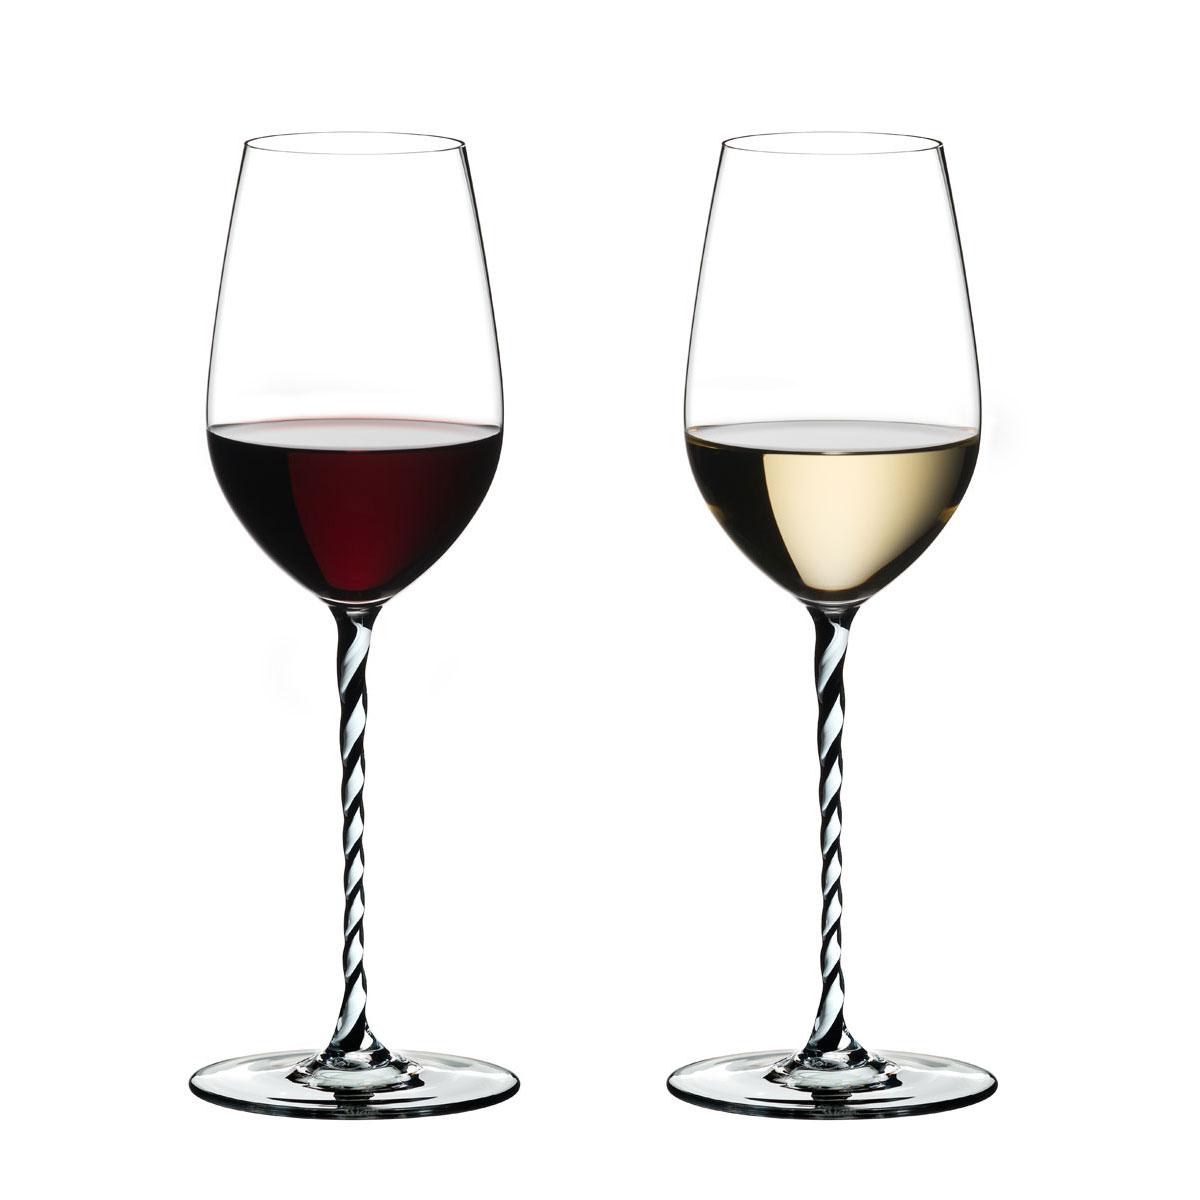 Riedel Fatto A Mano, Riesling, Chardonnay, Black and White Twist Wine Glass